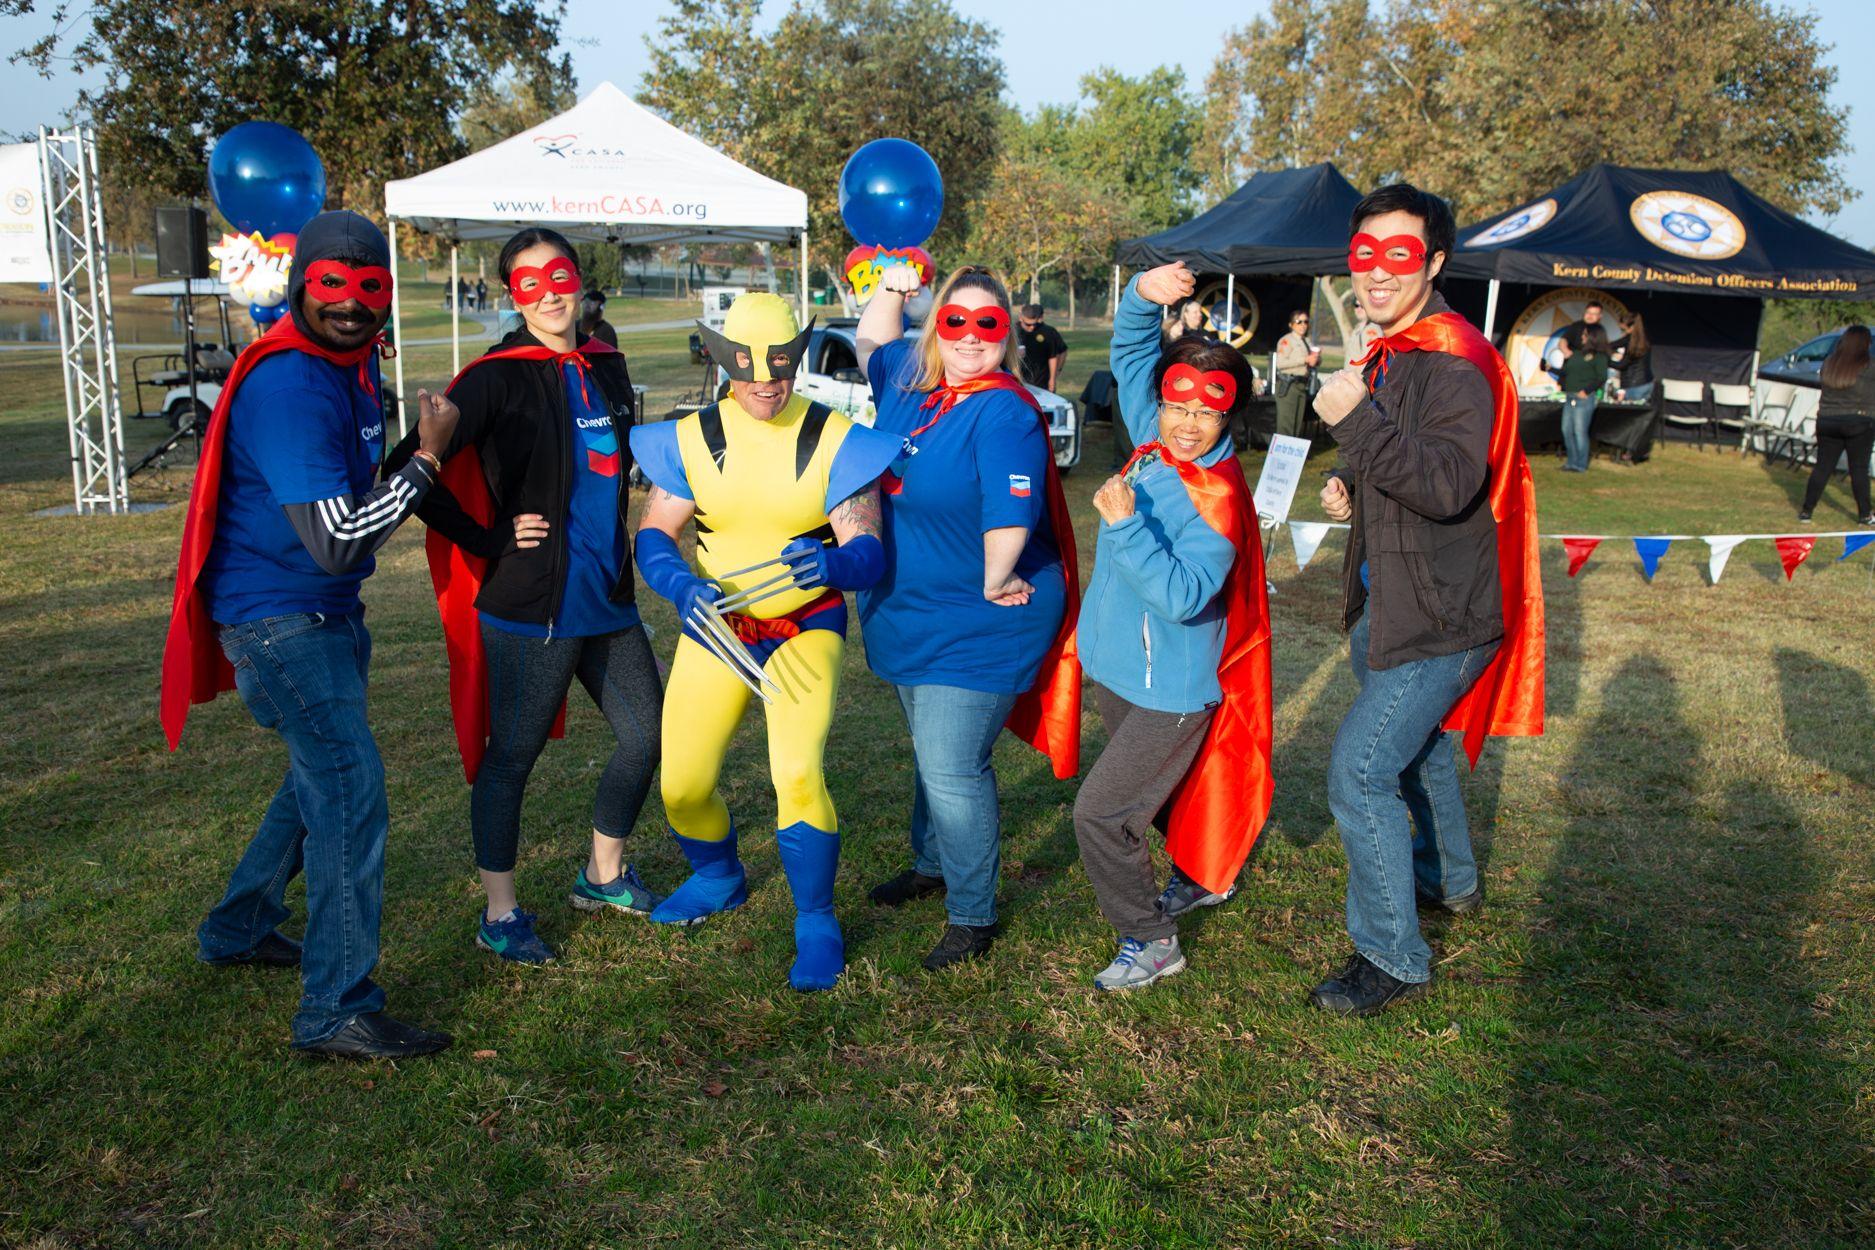 November Superhero Run